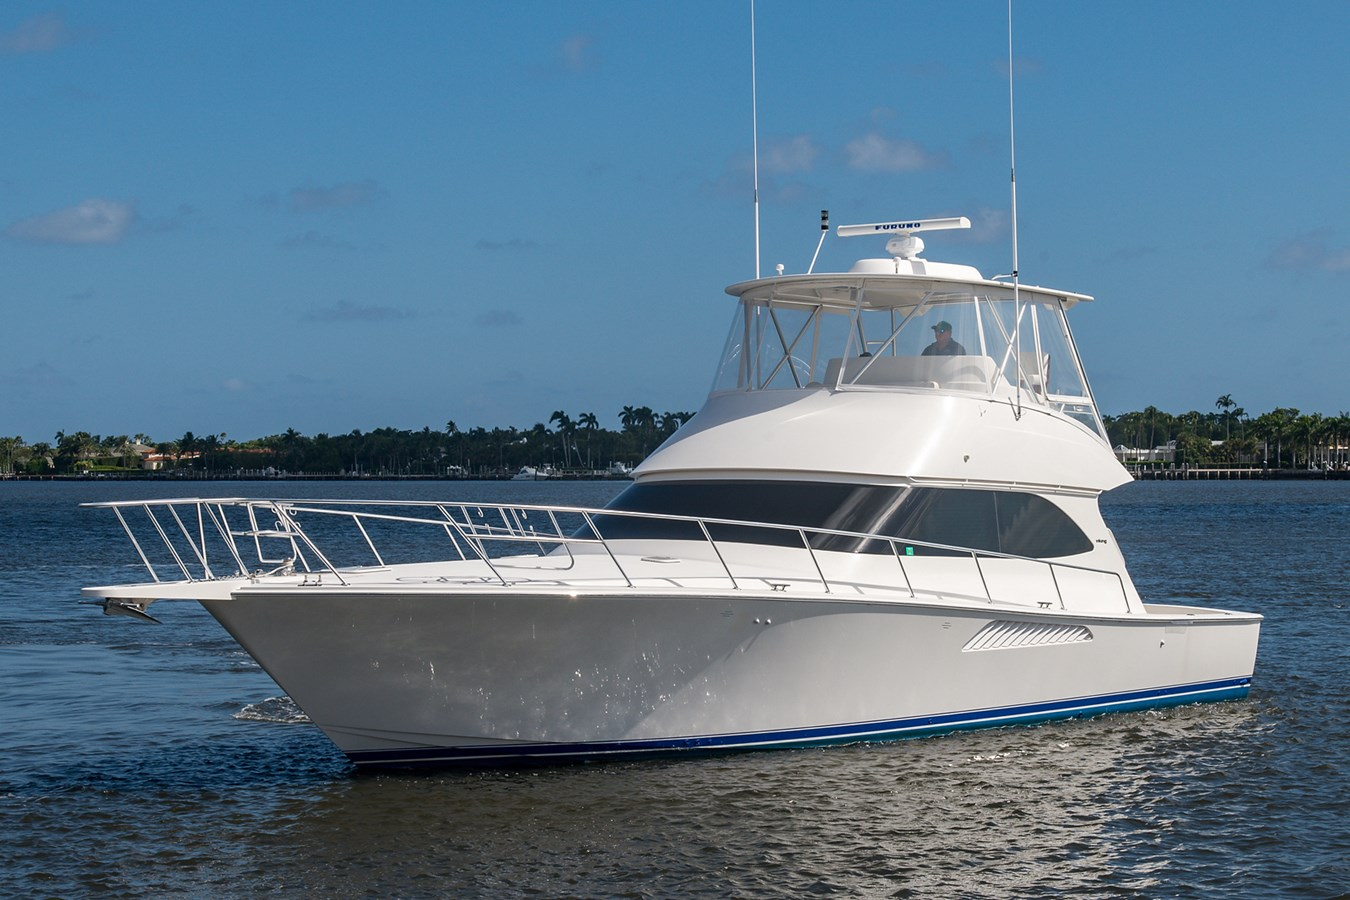 Orion_Bow Profile5 2009 VIKING 50 Convertible Sport Fisherman 2941691